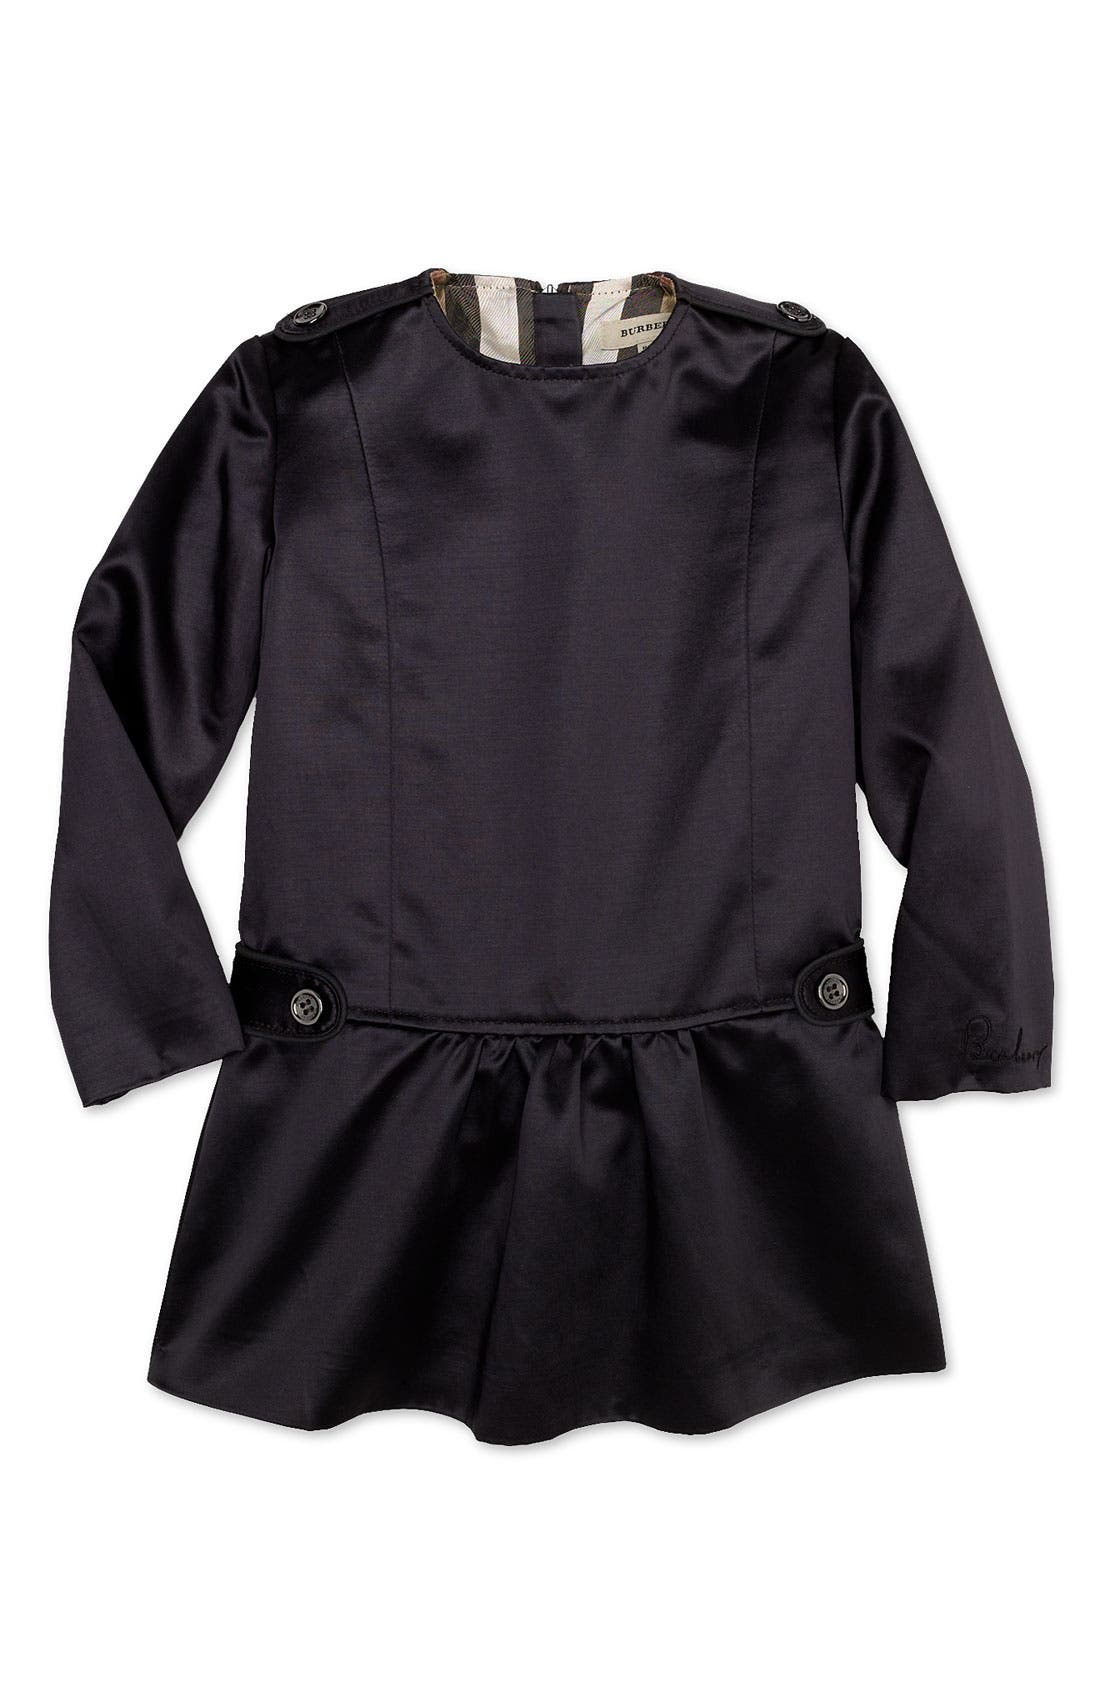 Main Image - Burberry Satin Dress (Infant)